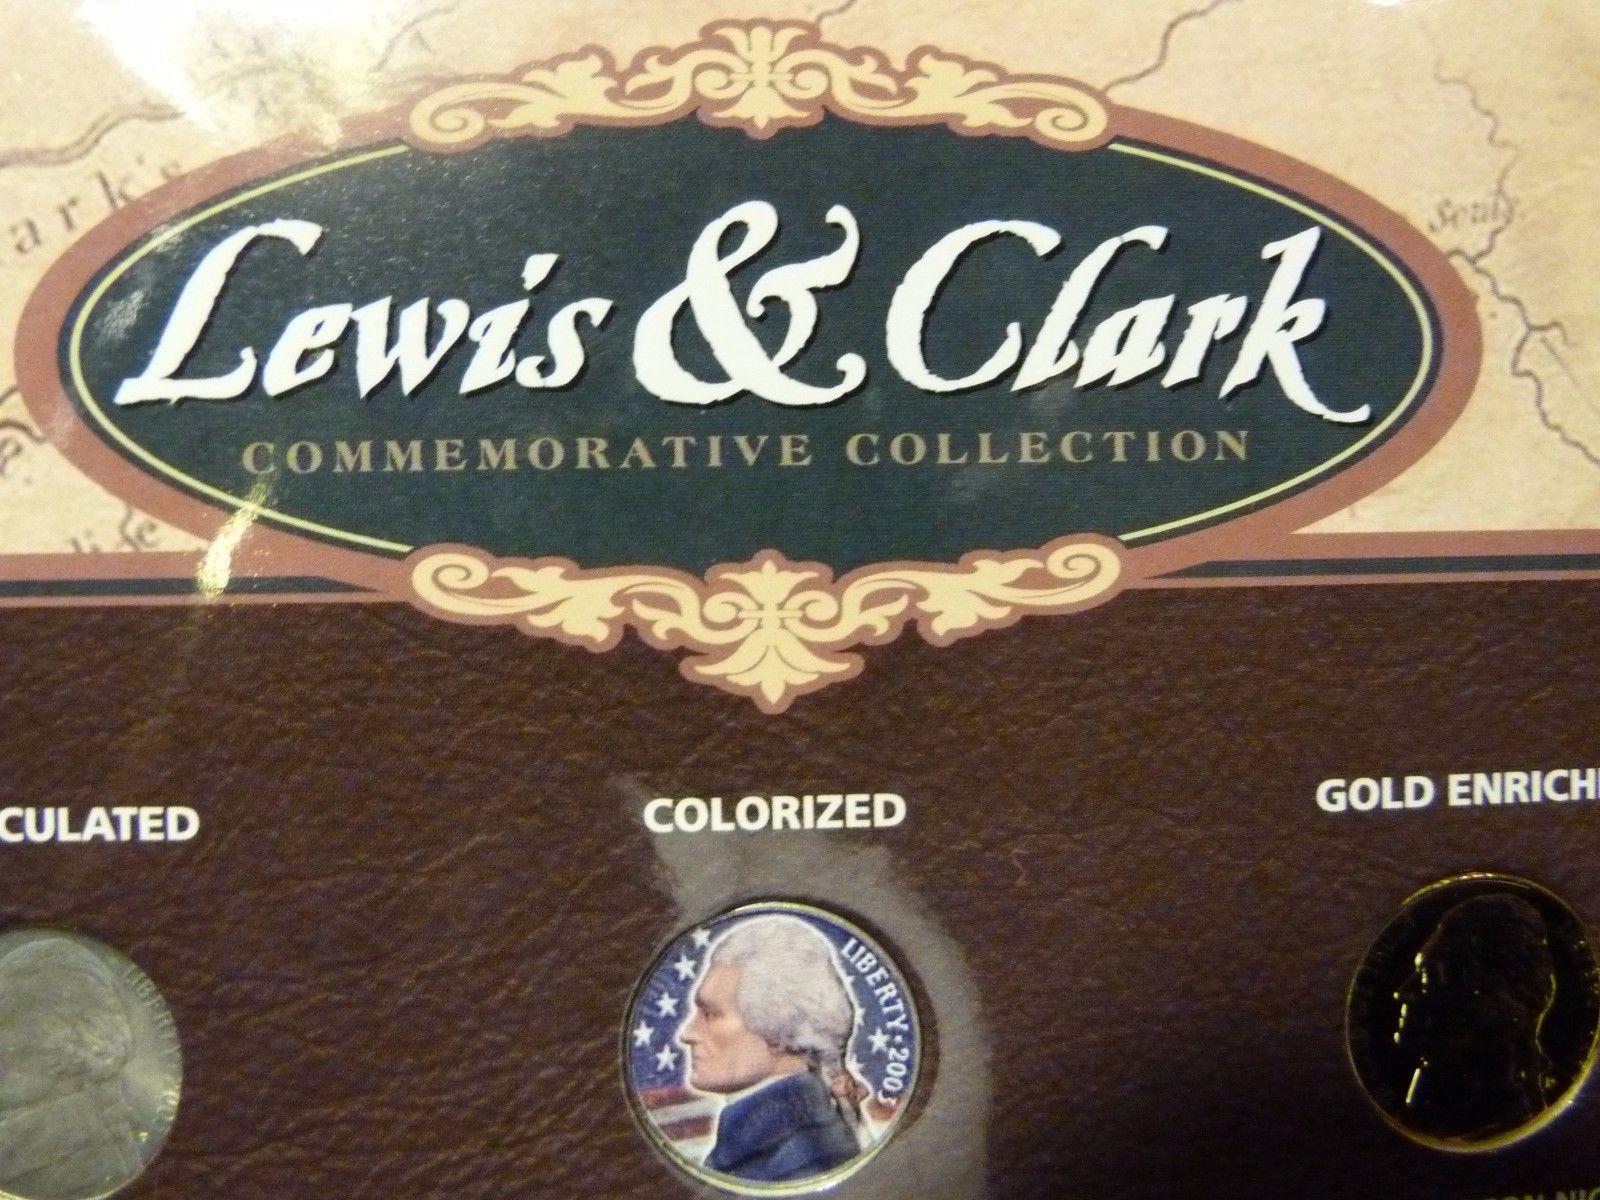 Lewis & Clark 18 Piece Nickel Set by U.S. Commemorative Gallery